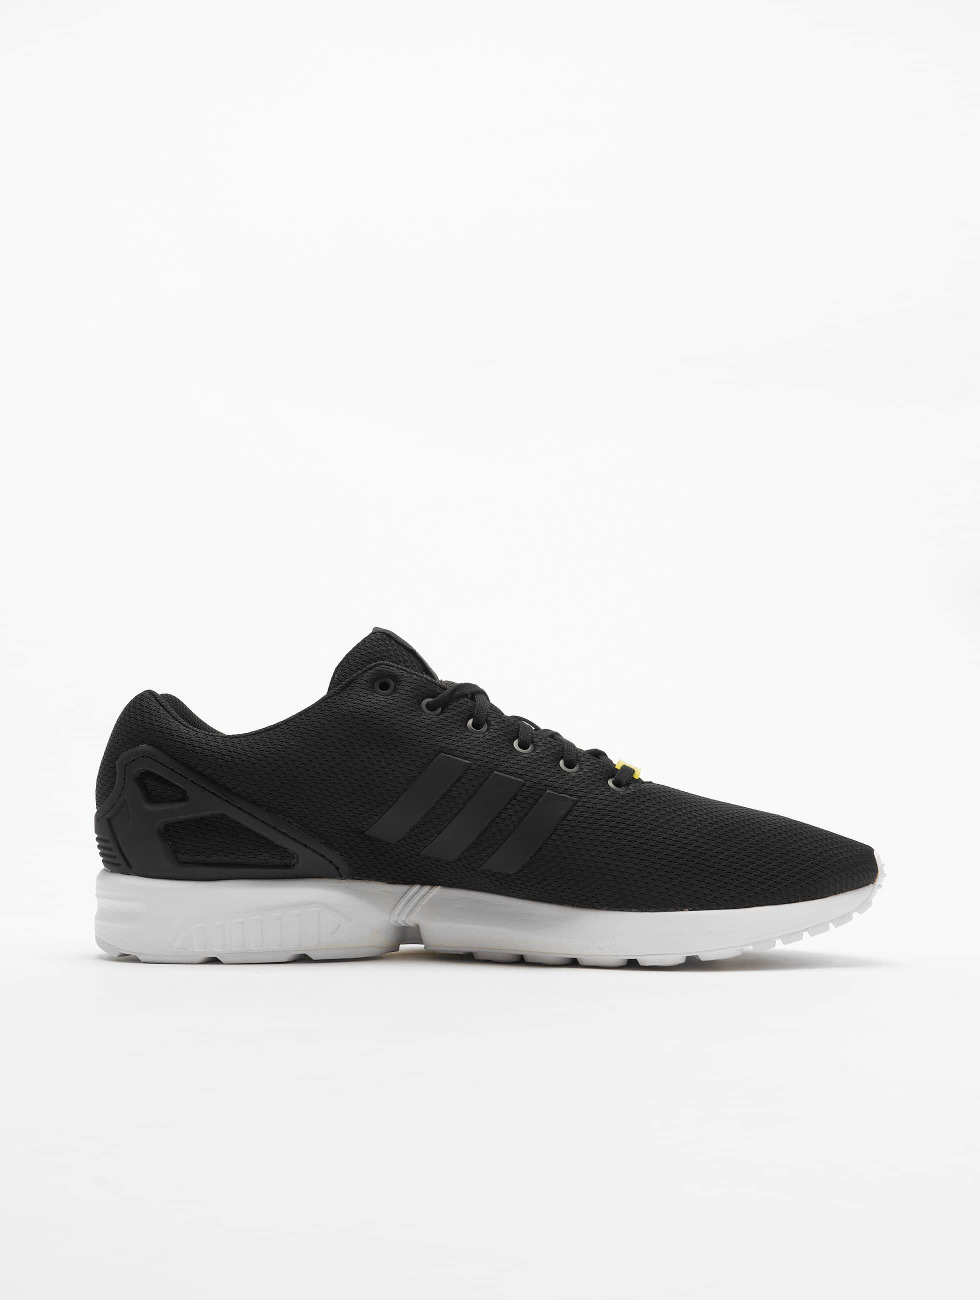 Adidas Originals Scarpa / Sneaker Zx Flusso In Nero 128300 xc4M4dqTi2